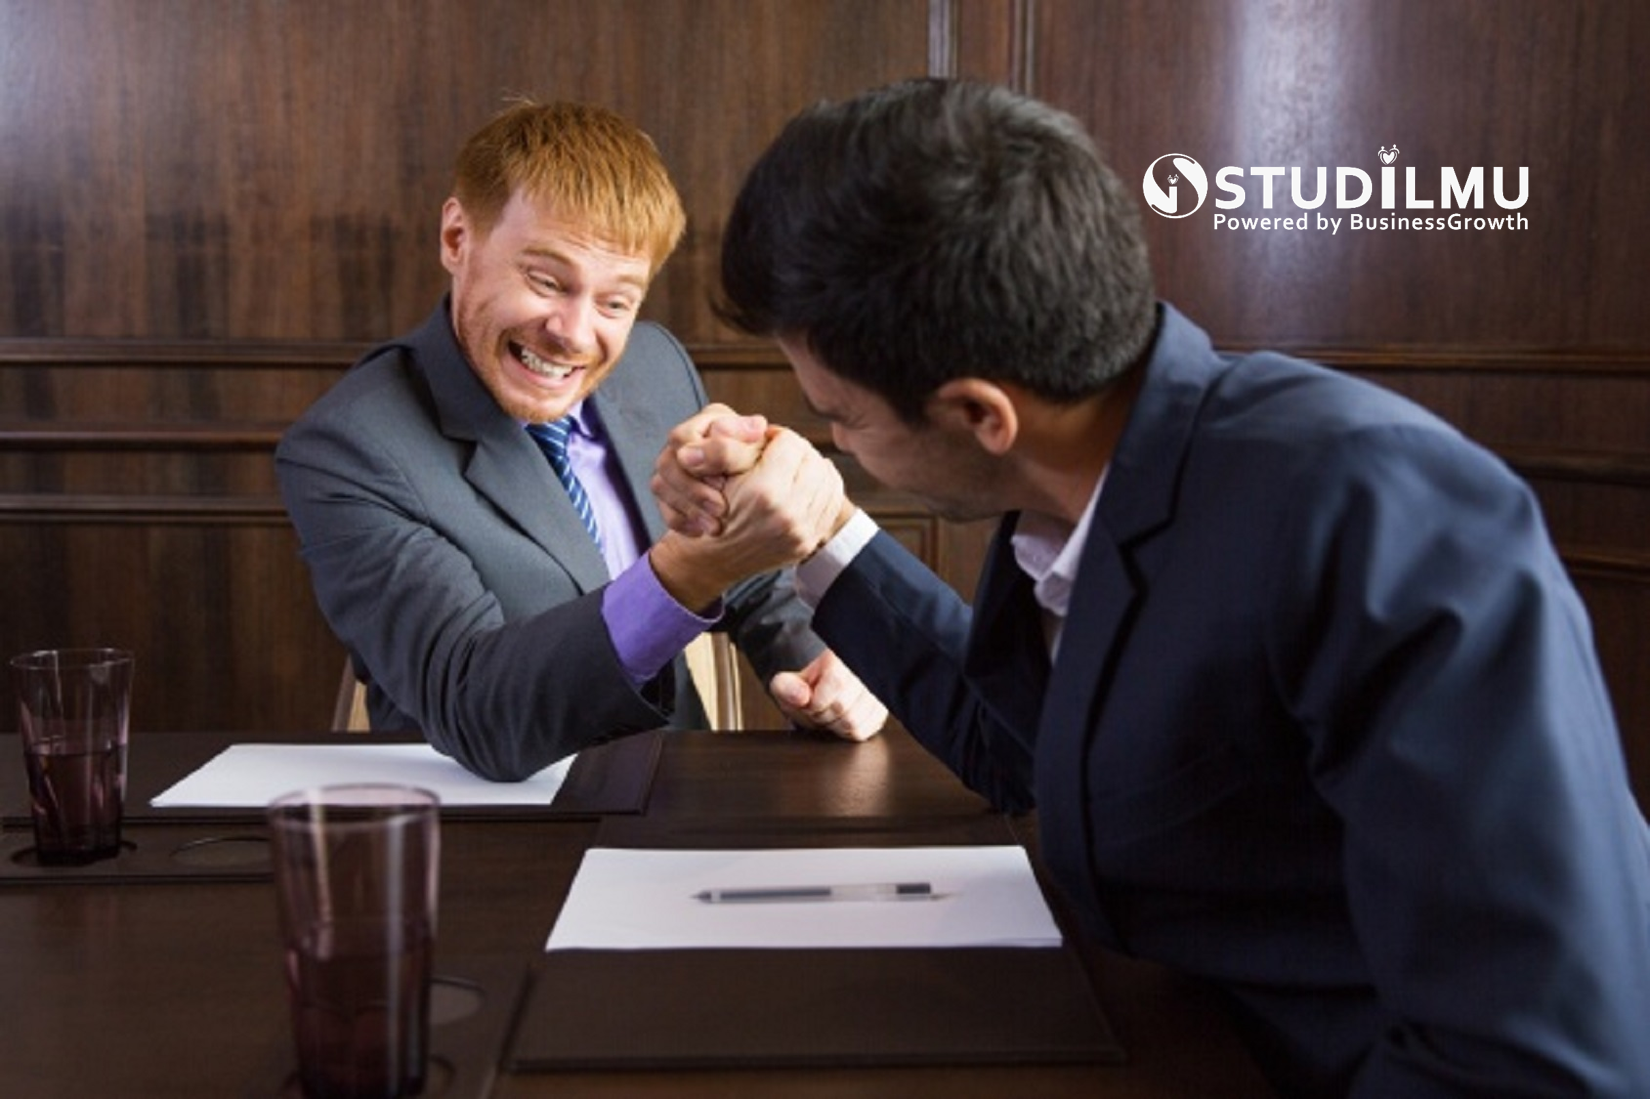 STUDILMU Career Advice - 4 Cara Menghadapi Kompetitor dengan Cara Pintar